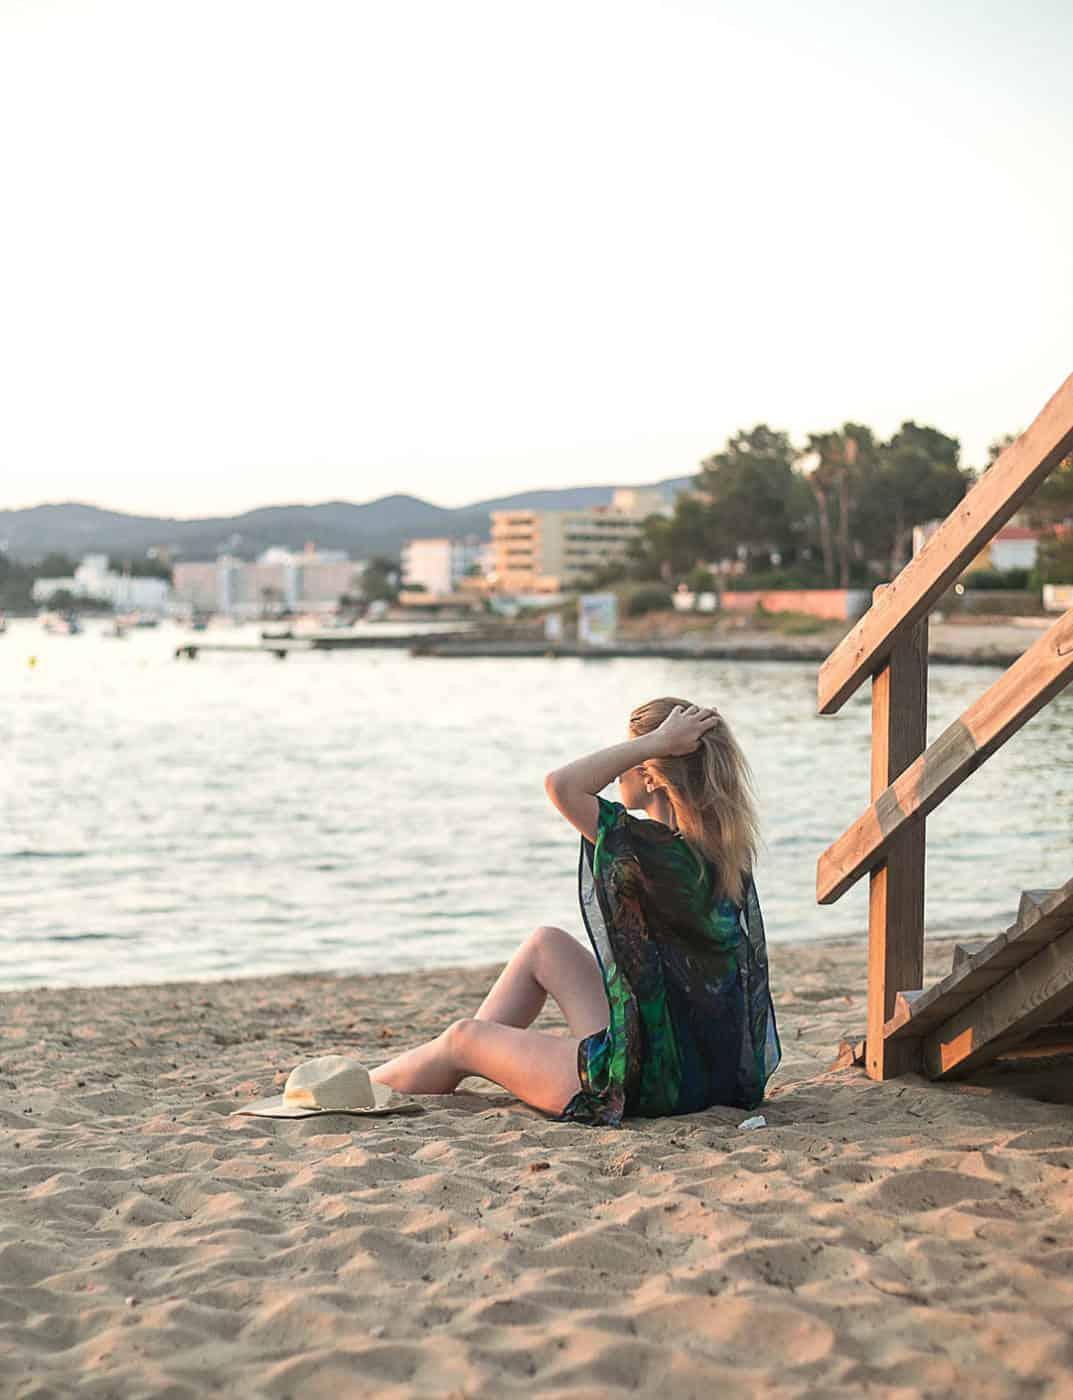 Woman in beach wear in Ibiza